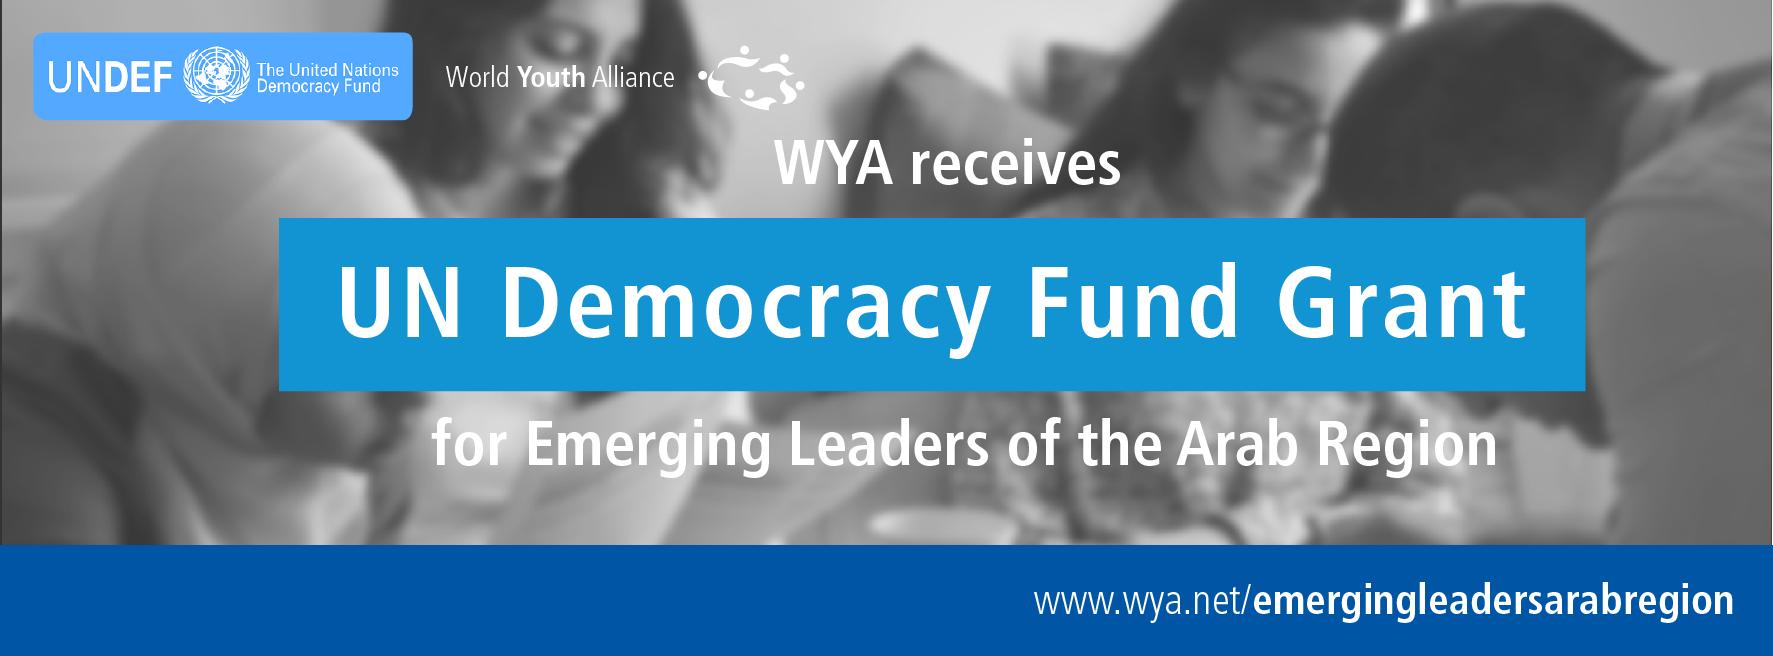 World Youth Alliance – Emerging Leaders of the Arab Region Program 2015